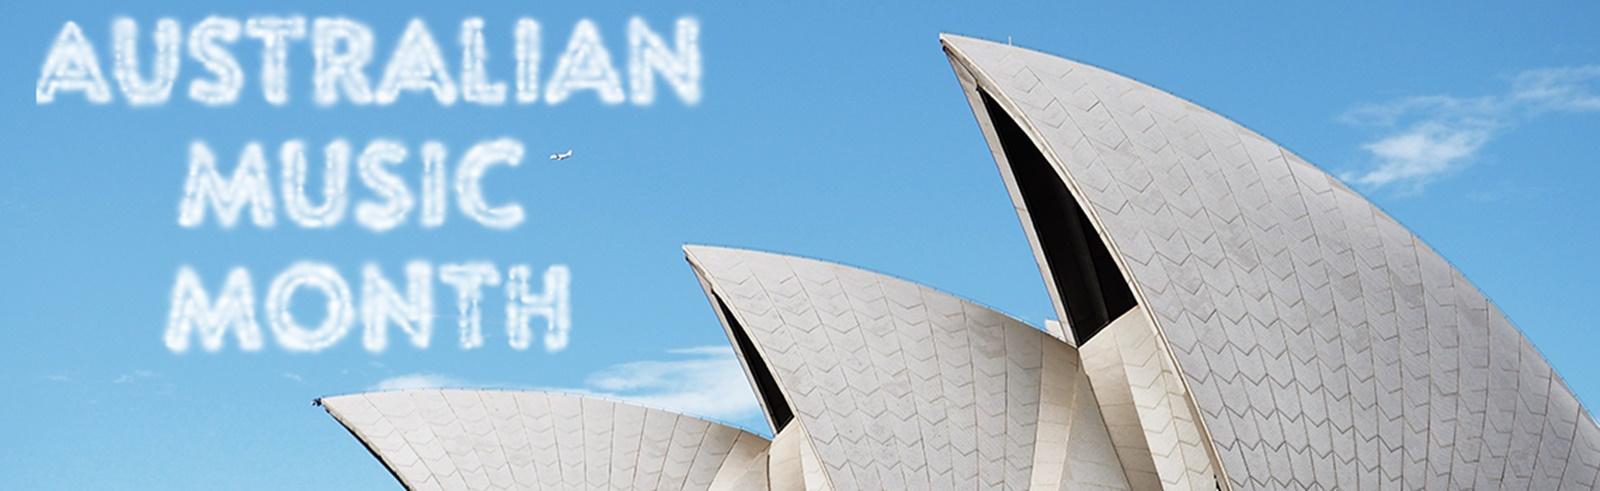 Australian Music Month